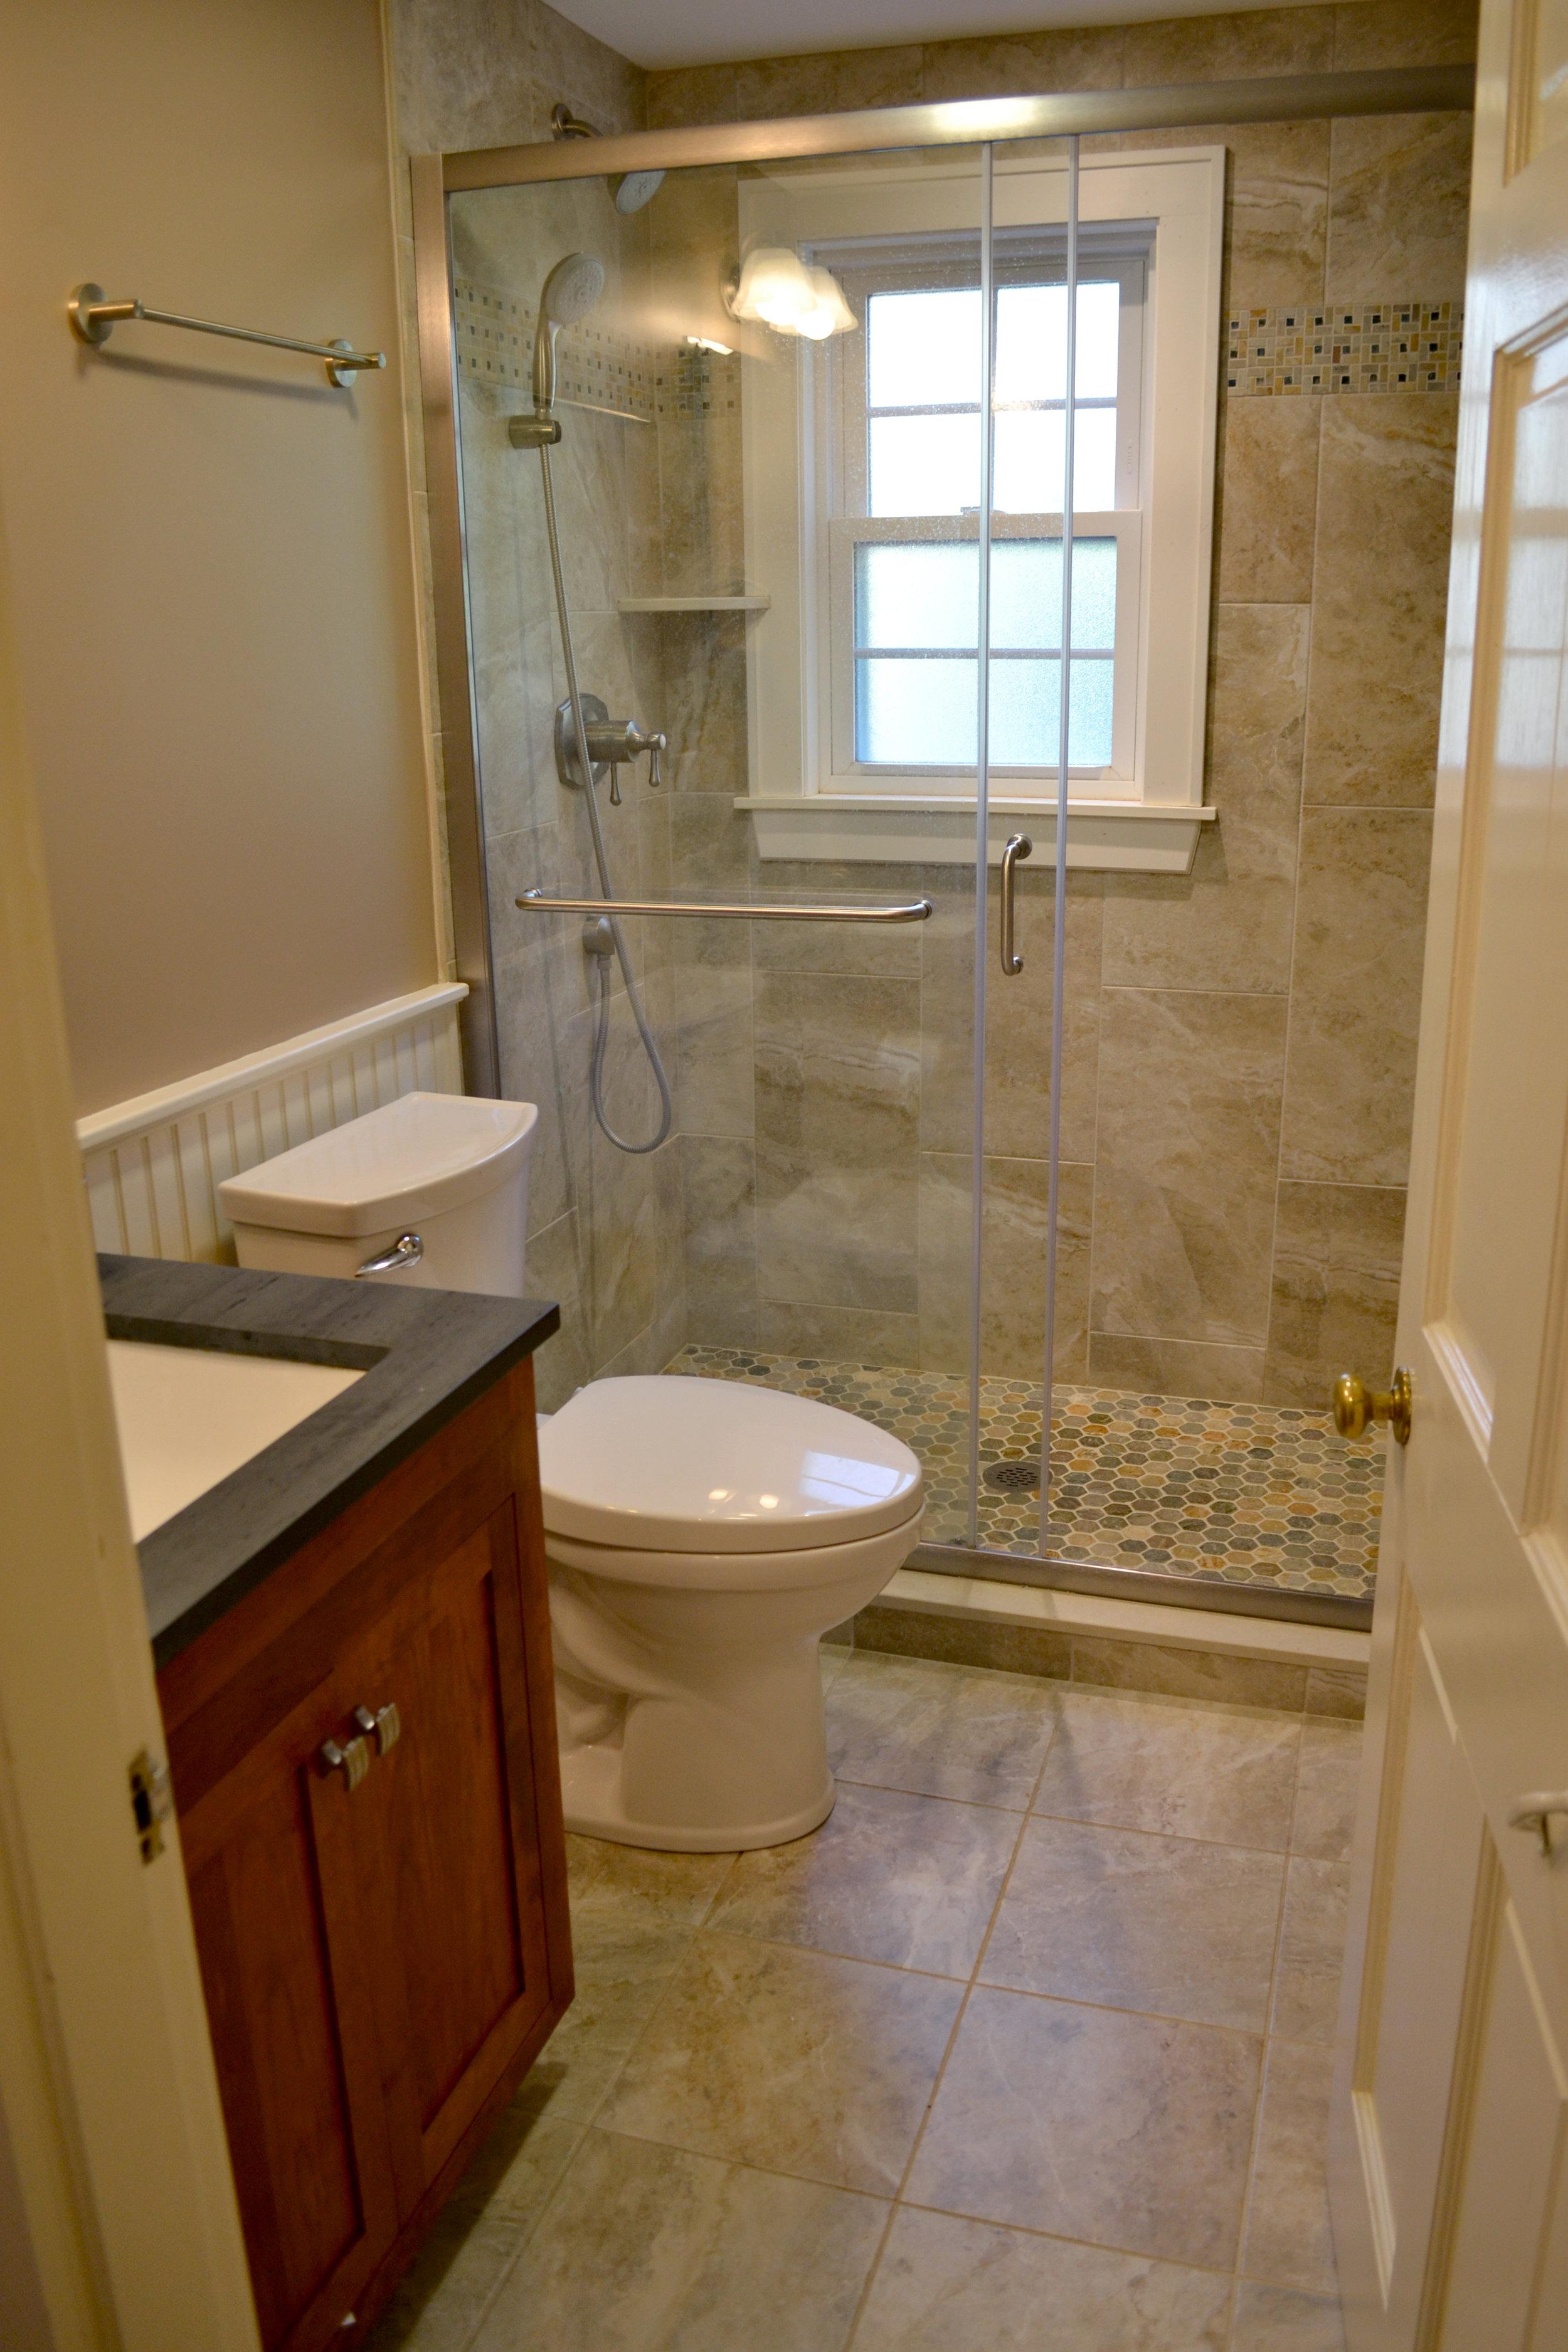 Bathroom Design | Acton Massachusetts | Remodel